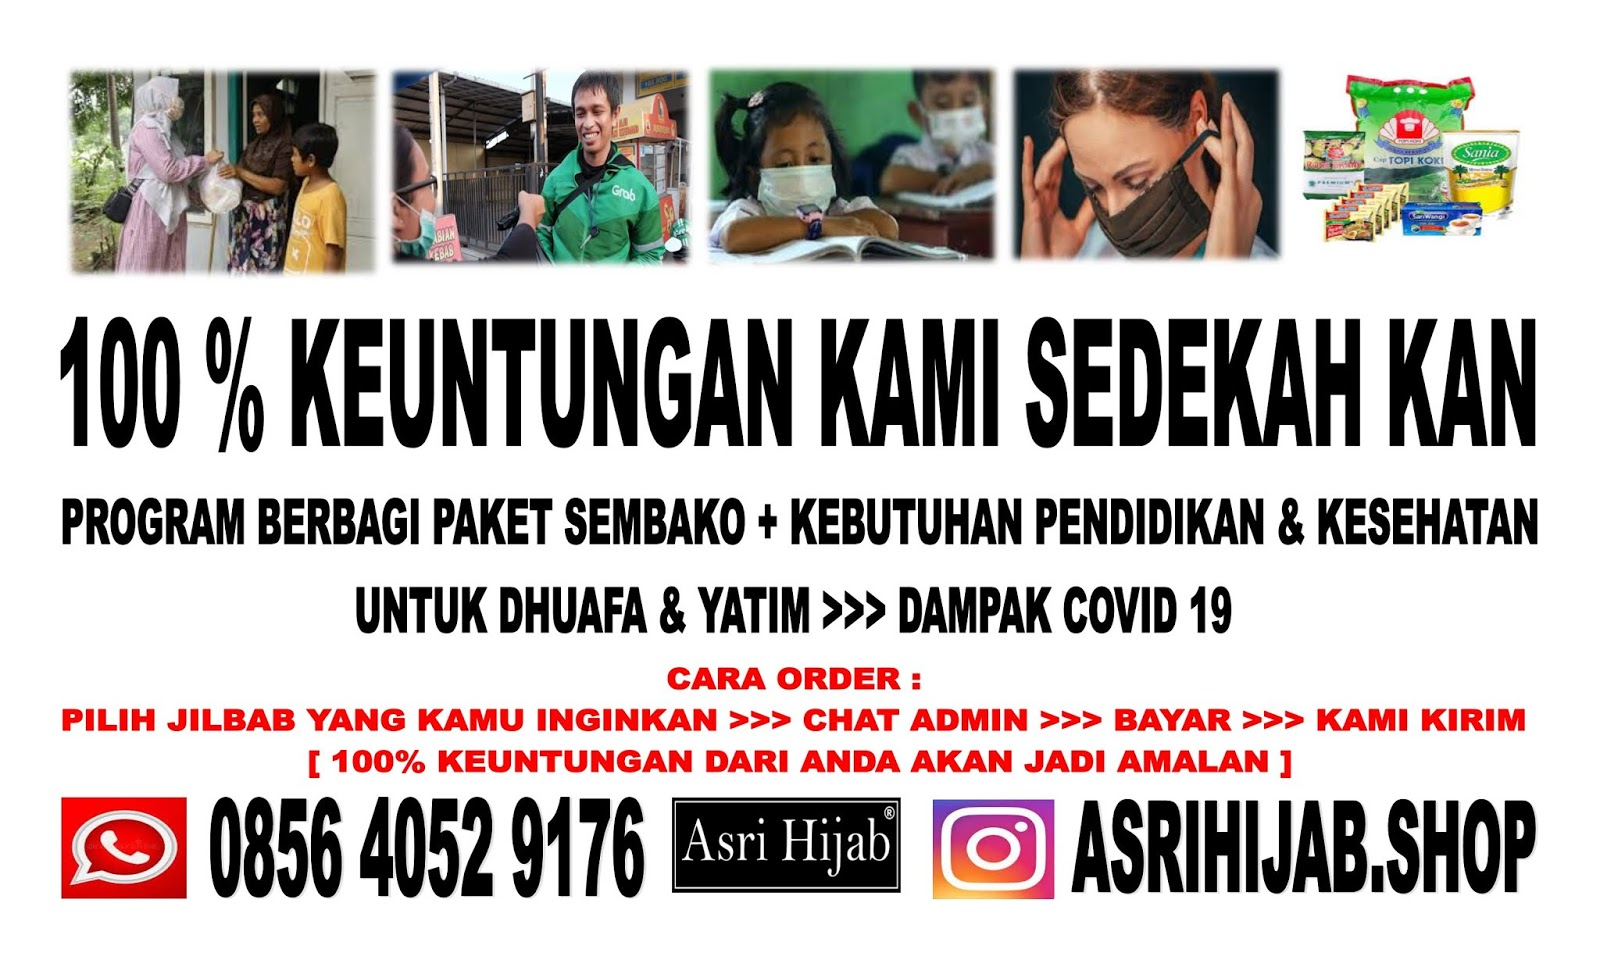 Program Berbagi Keuntungan 100% Hasil Penjualan Jilbab Semarang